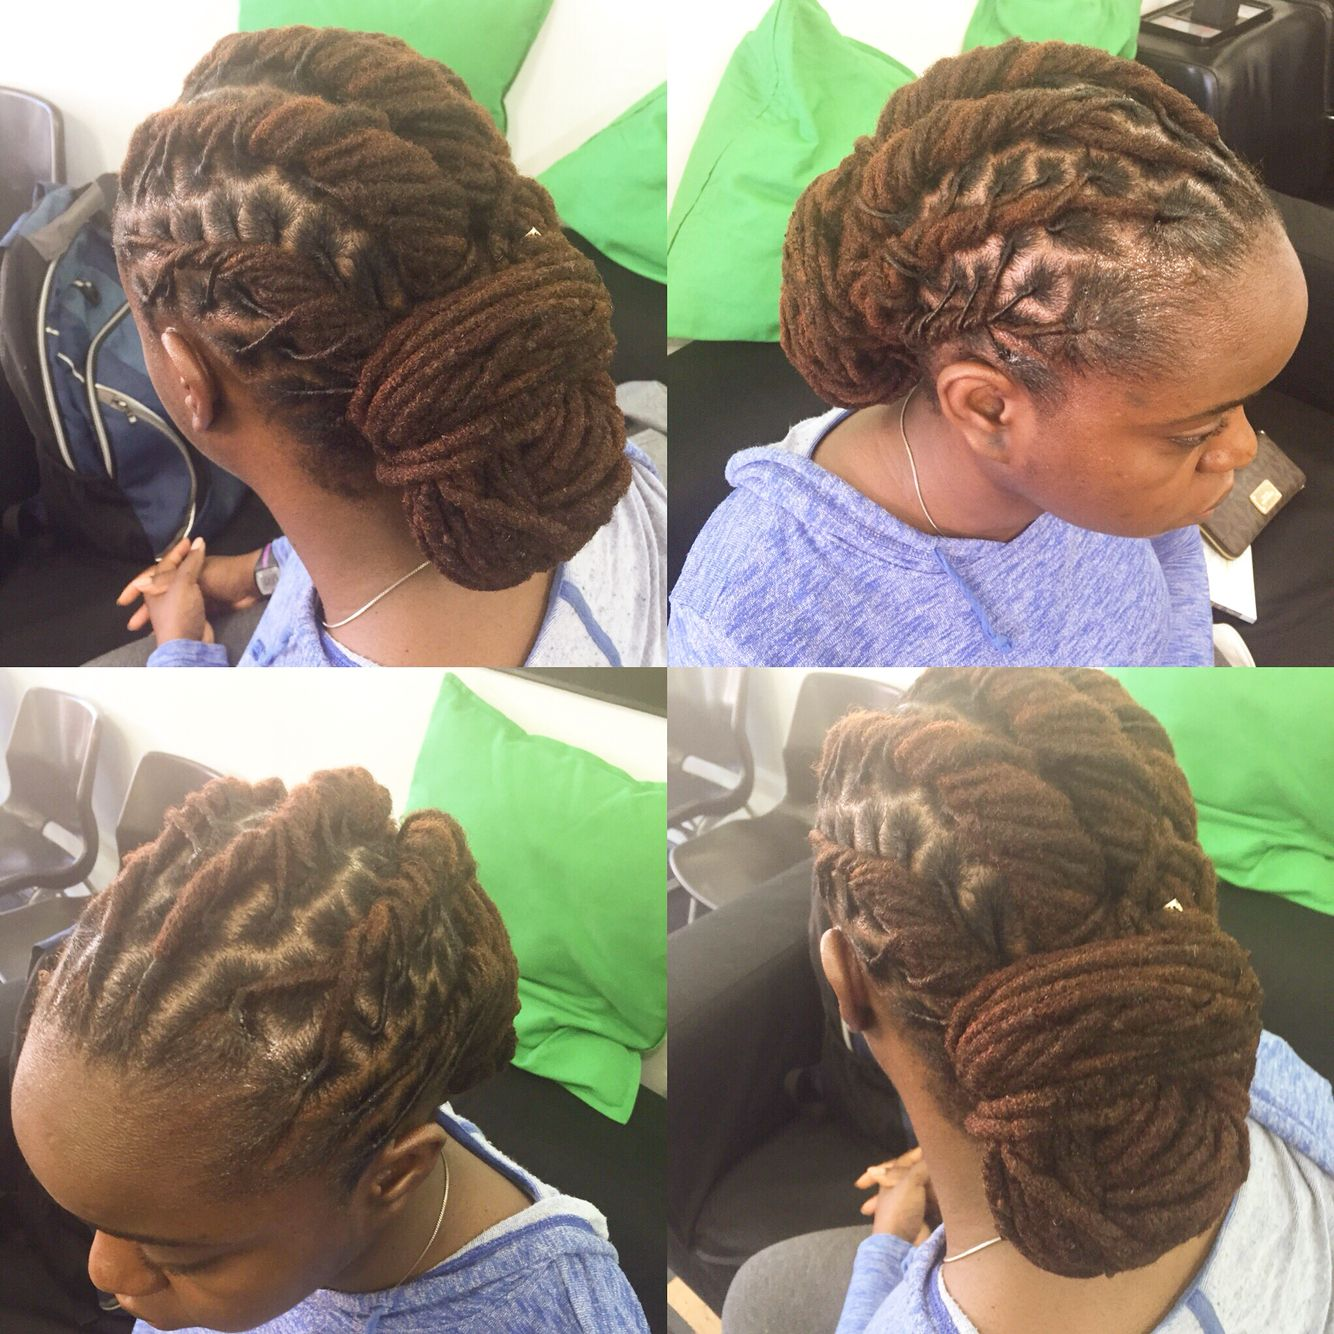 pinup dreadlocks hairstyle | dreadlocks by lm in 2019 | hair